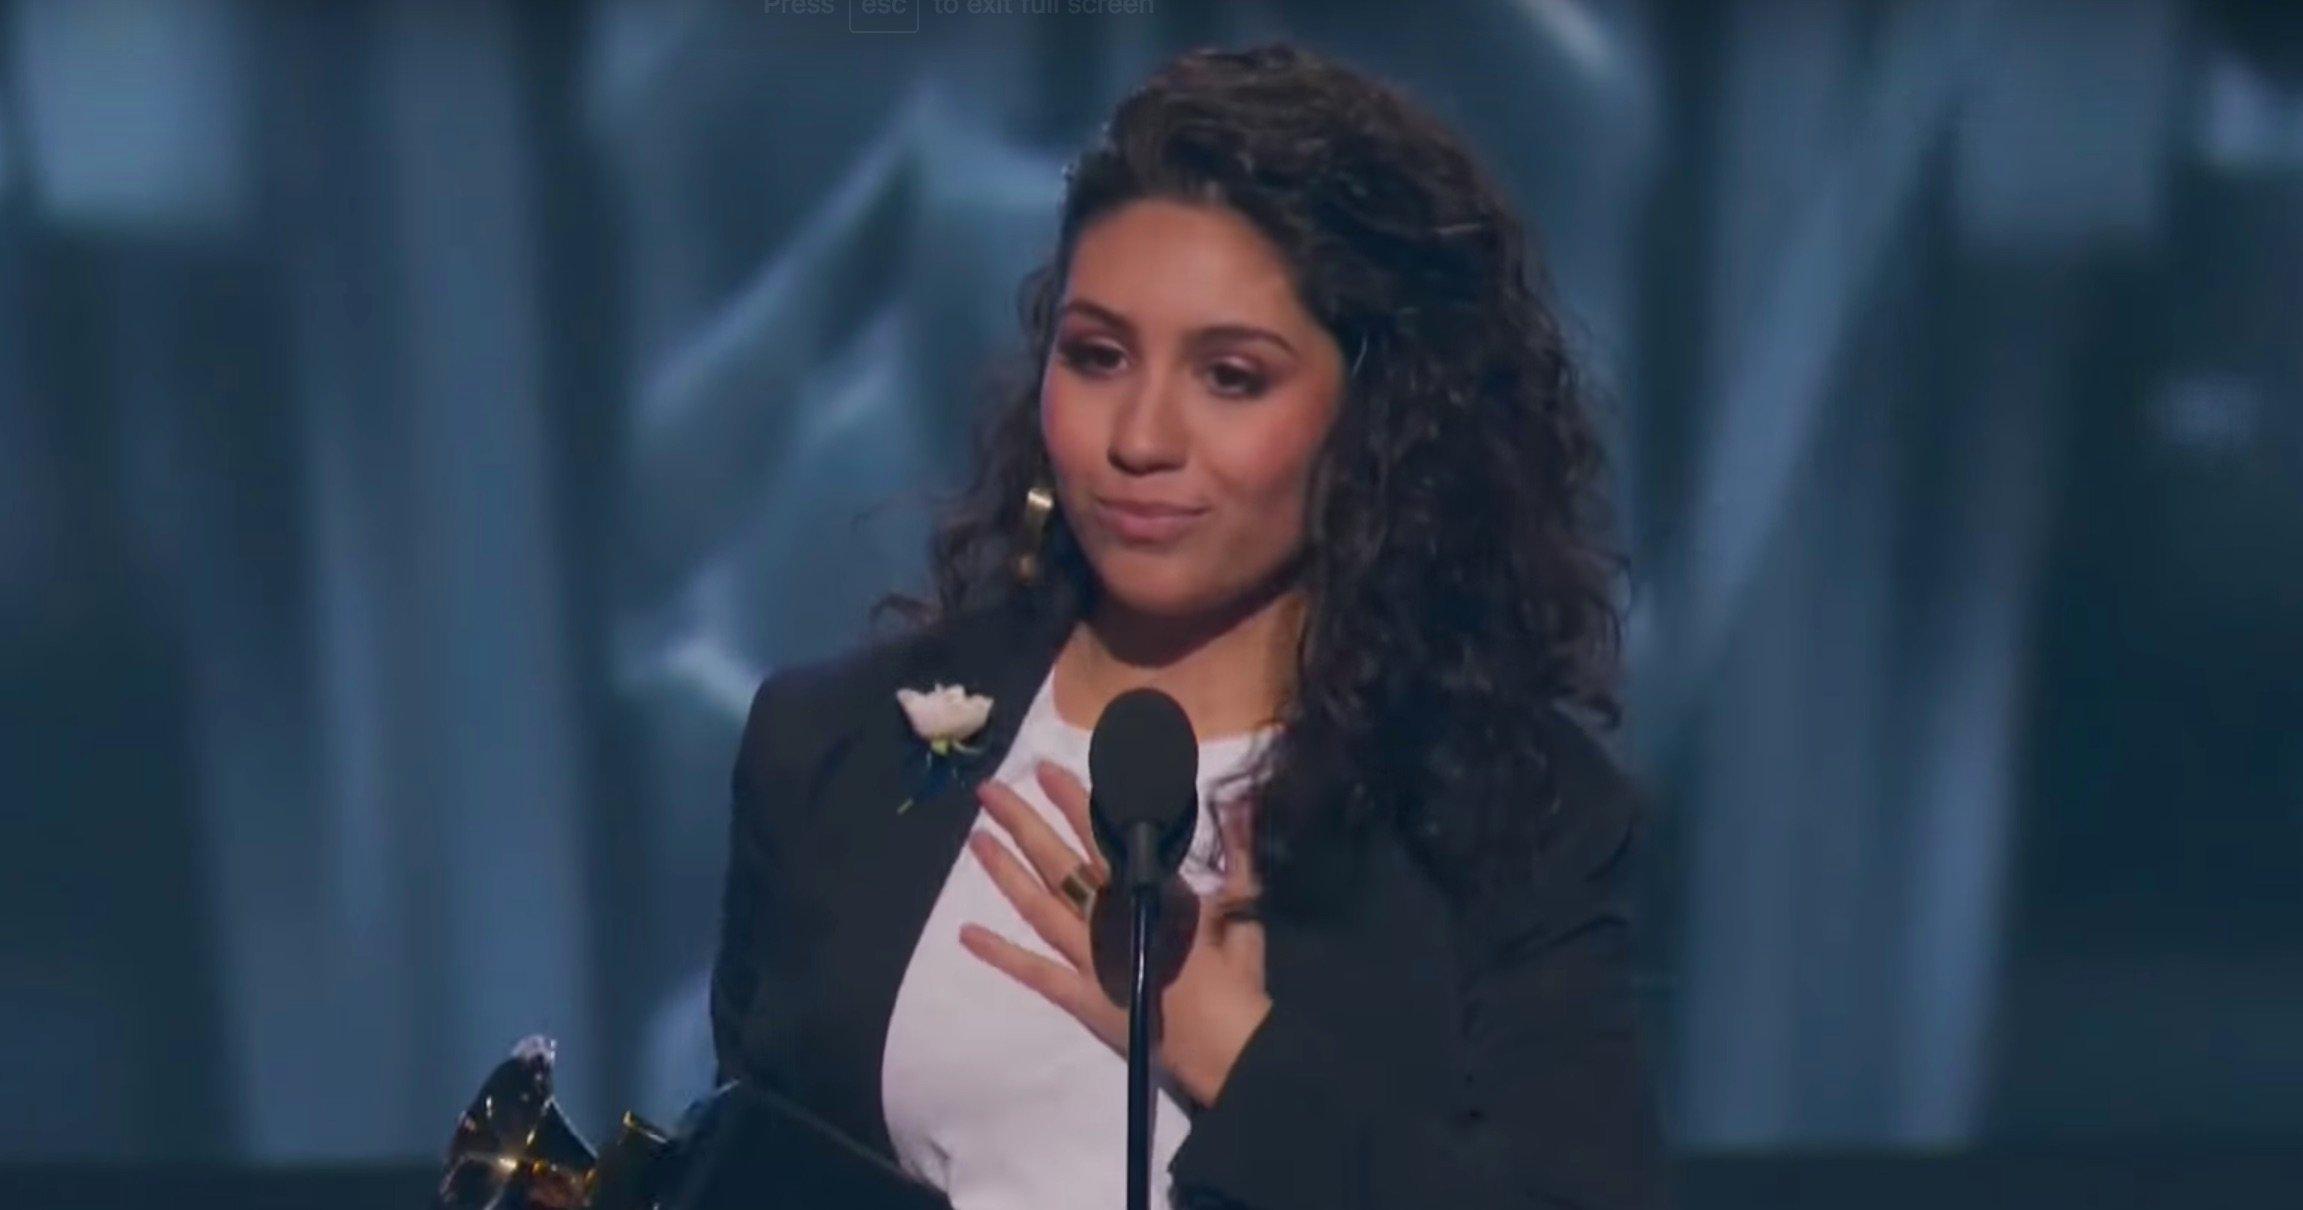 Alessia Cara winning a Grammy